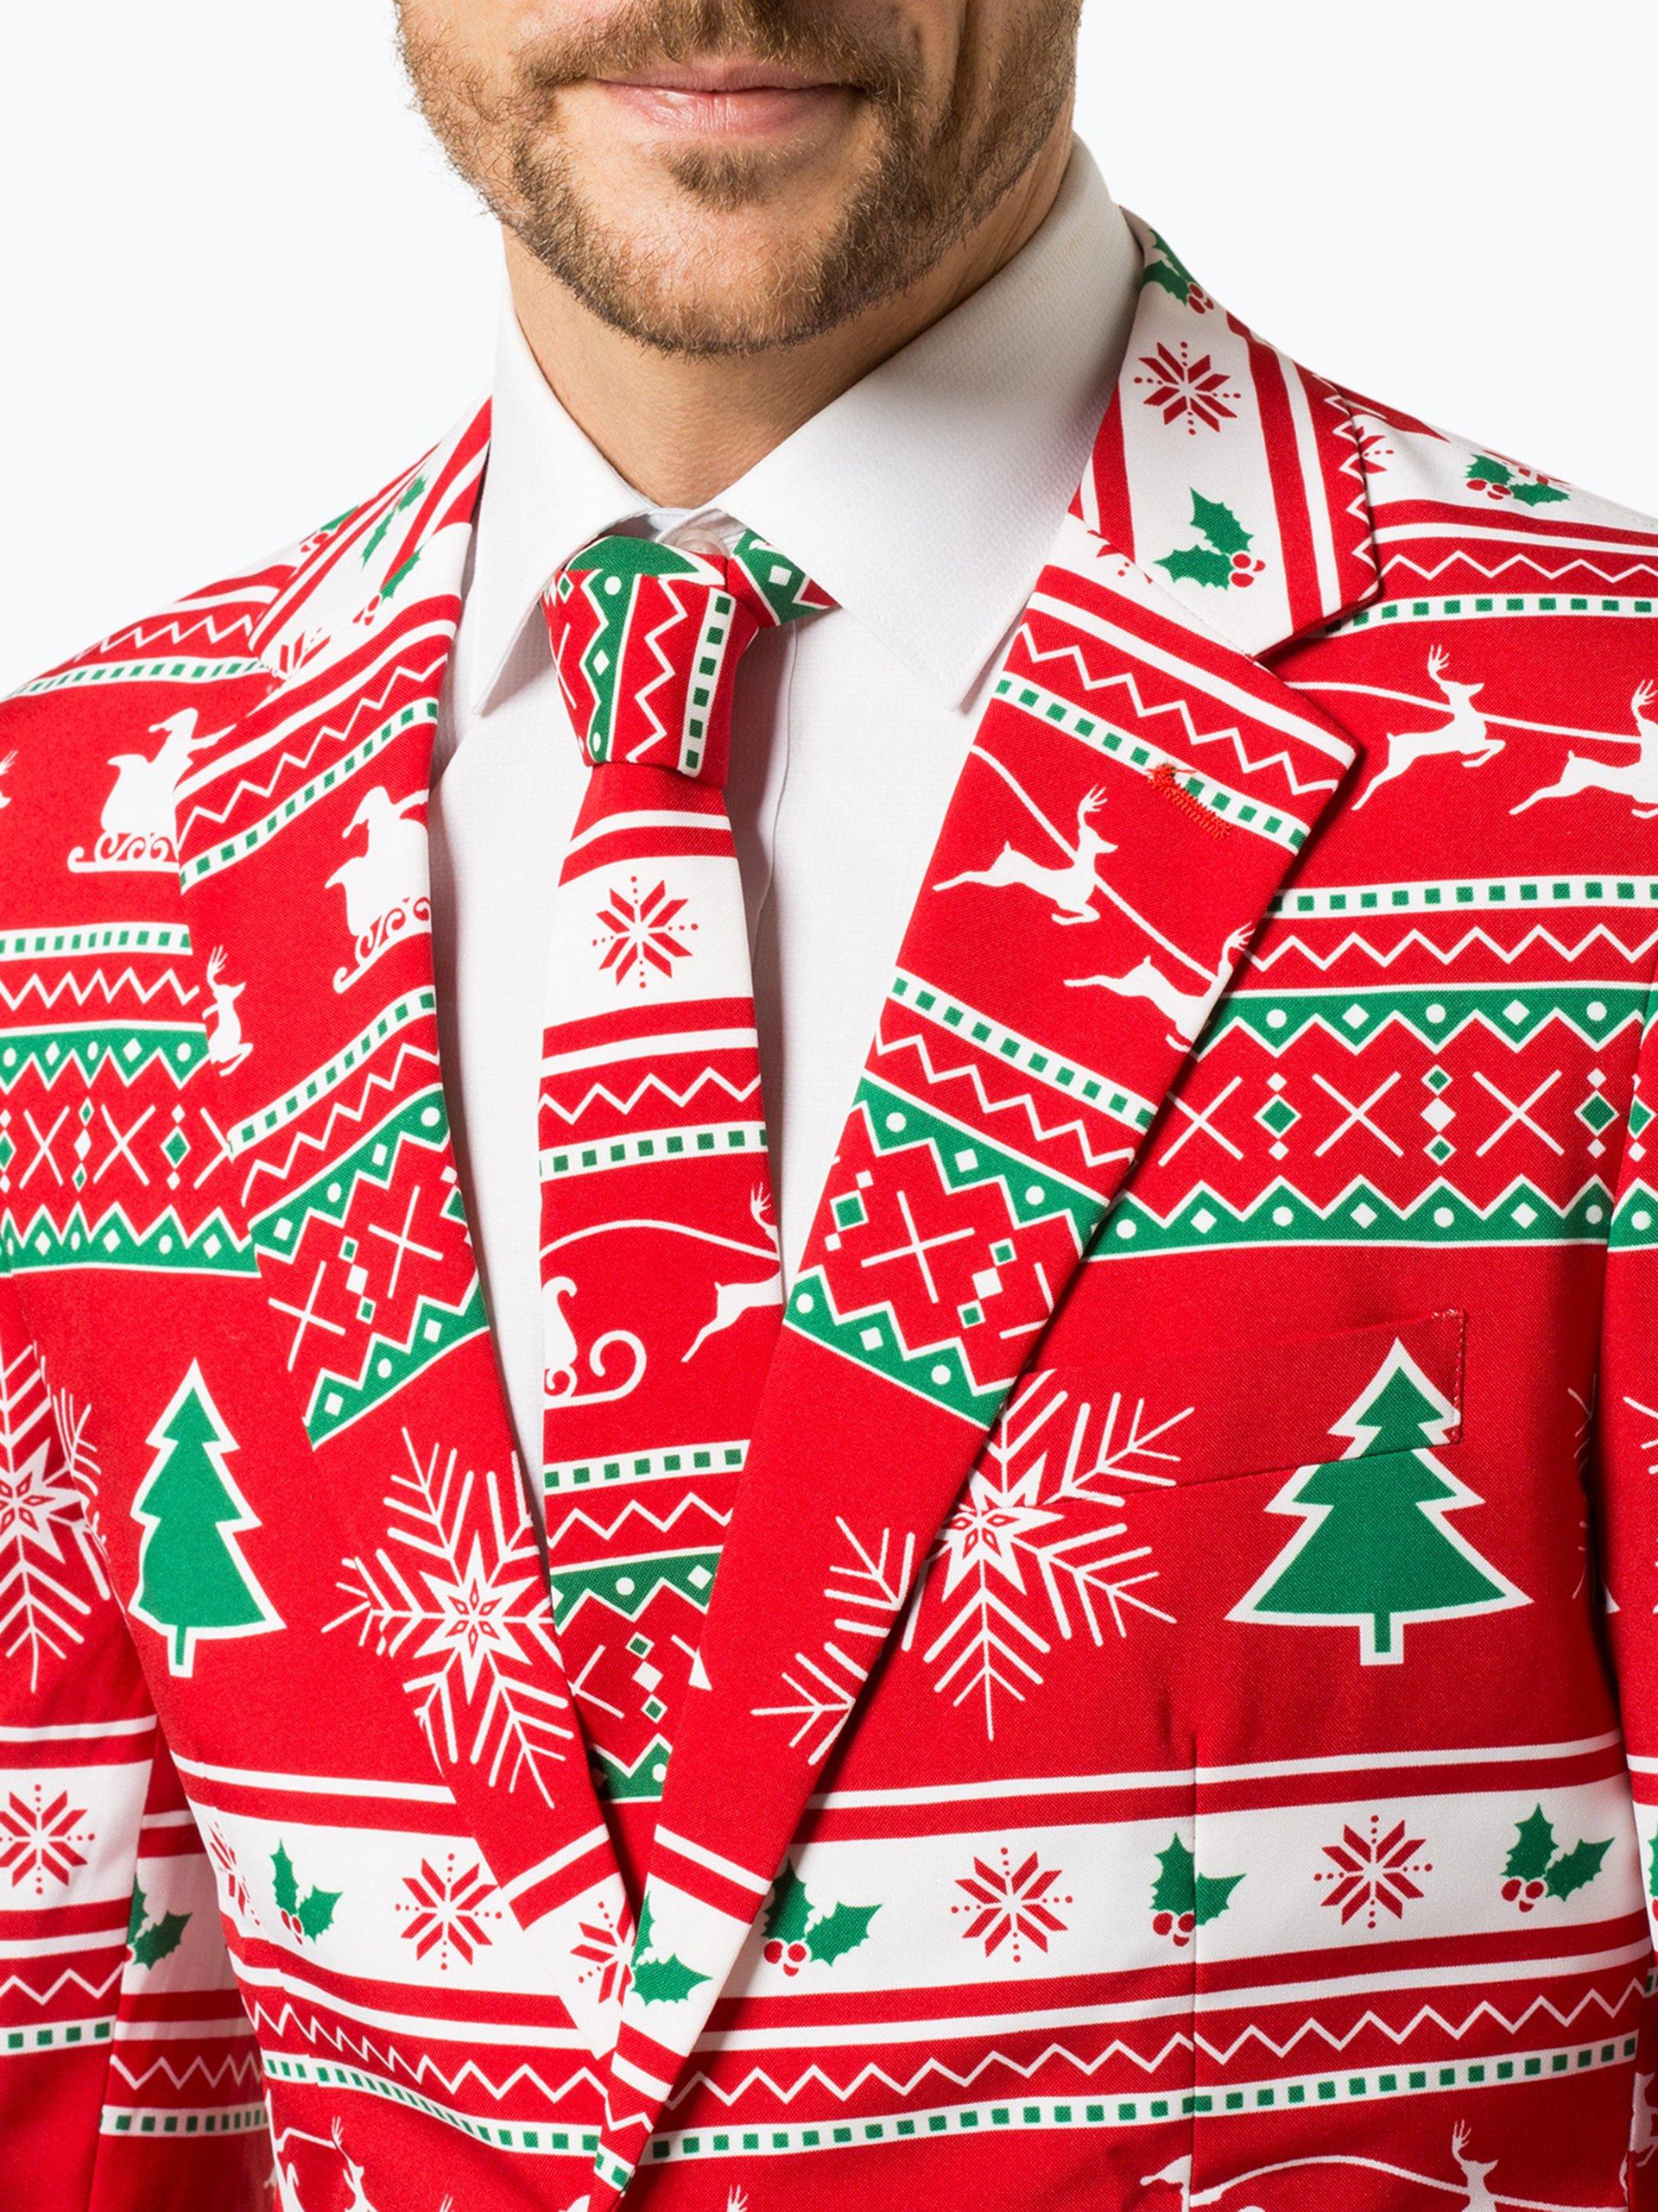 55c1daeddebc0 OppoSuits Garnitur męski z krawatem – Winter Wonderland kup online ...